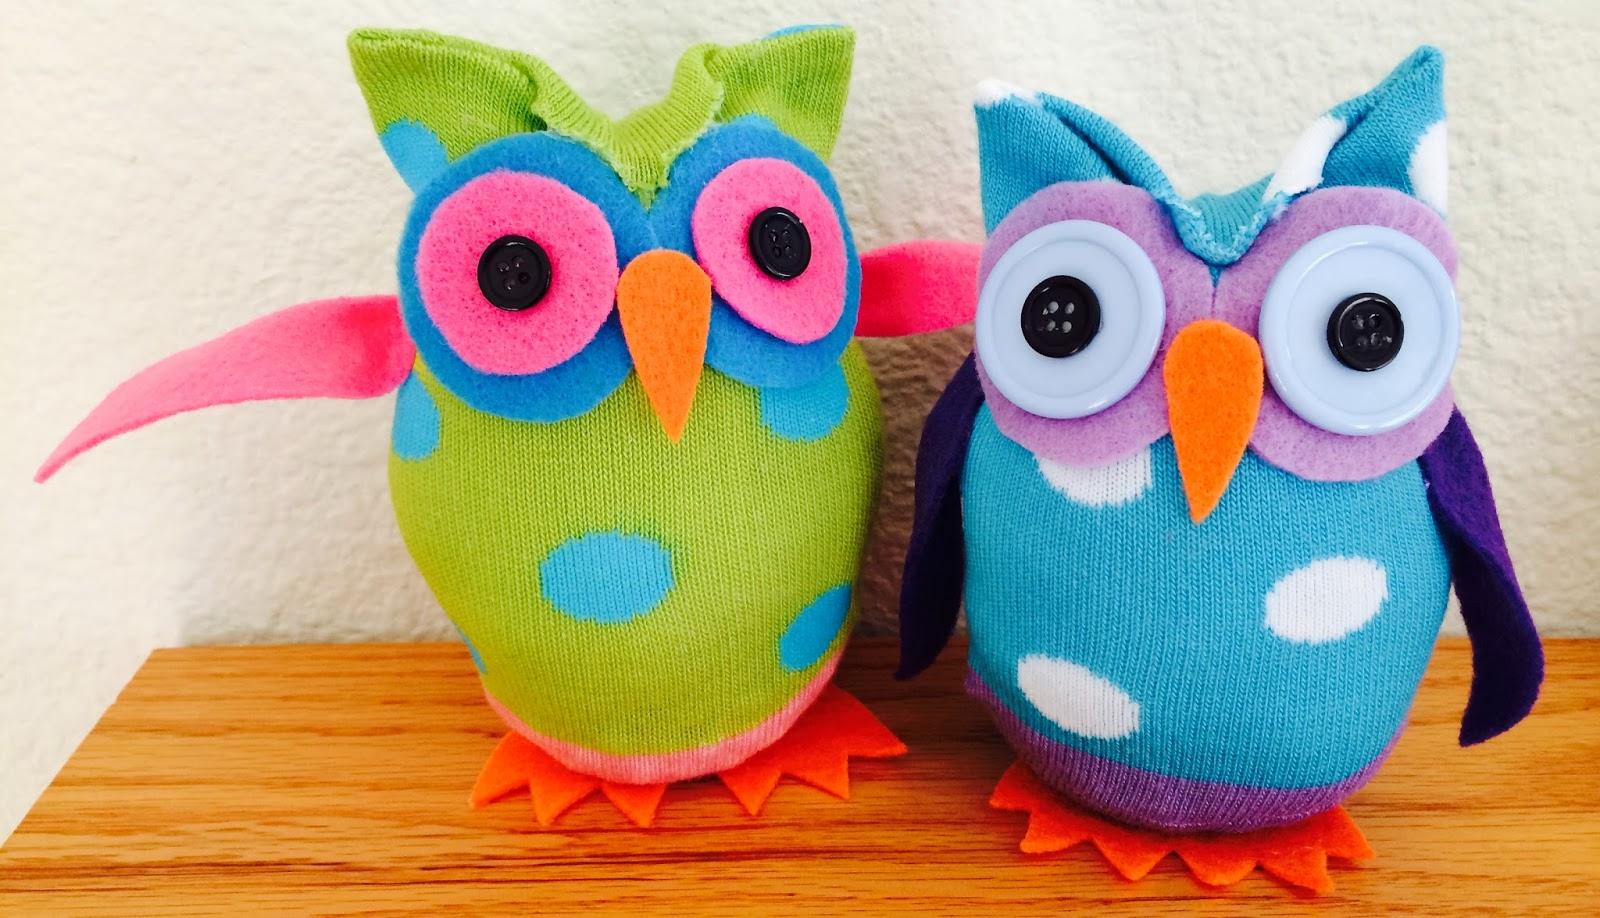 Kathy's AngelNik Designs & Art Project Ideas: No Sew Sock Owls